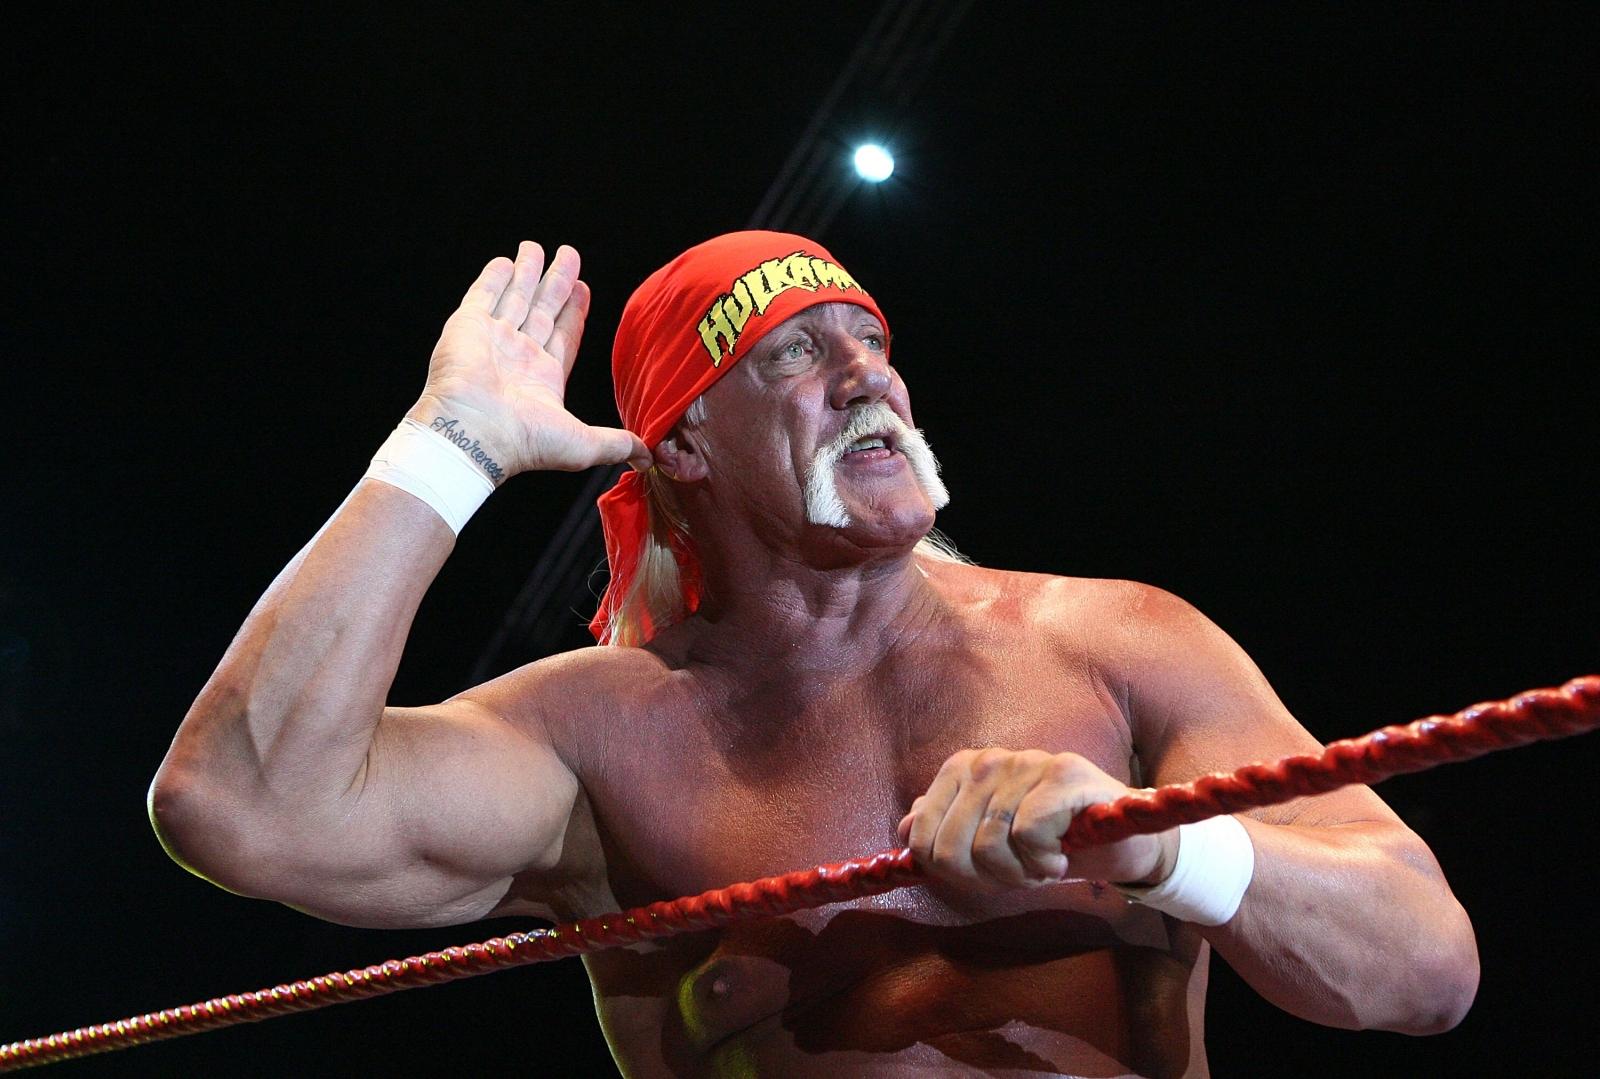 Hulk Hogan WWE Hall of Fame